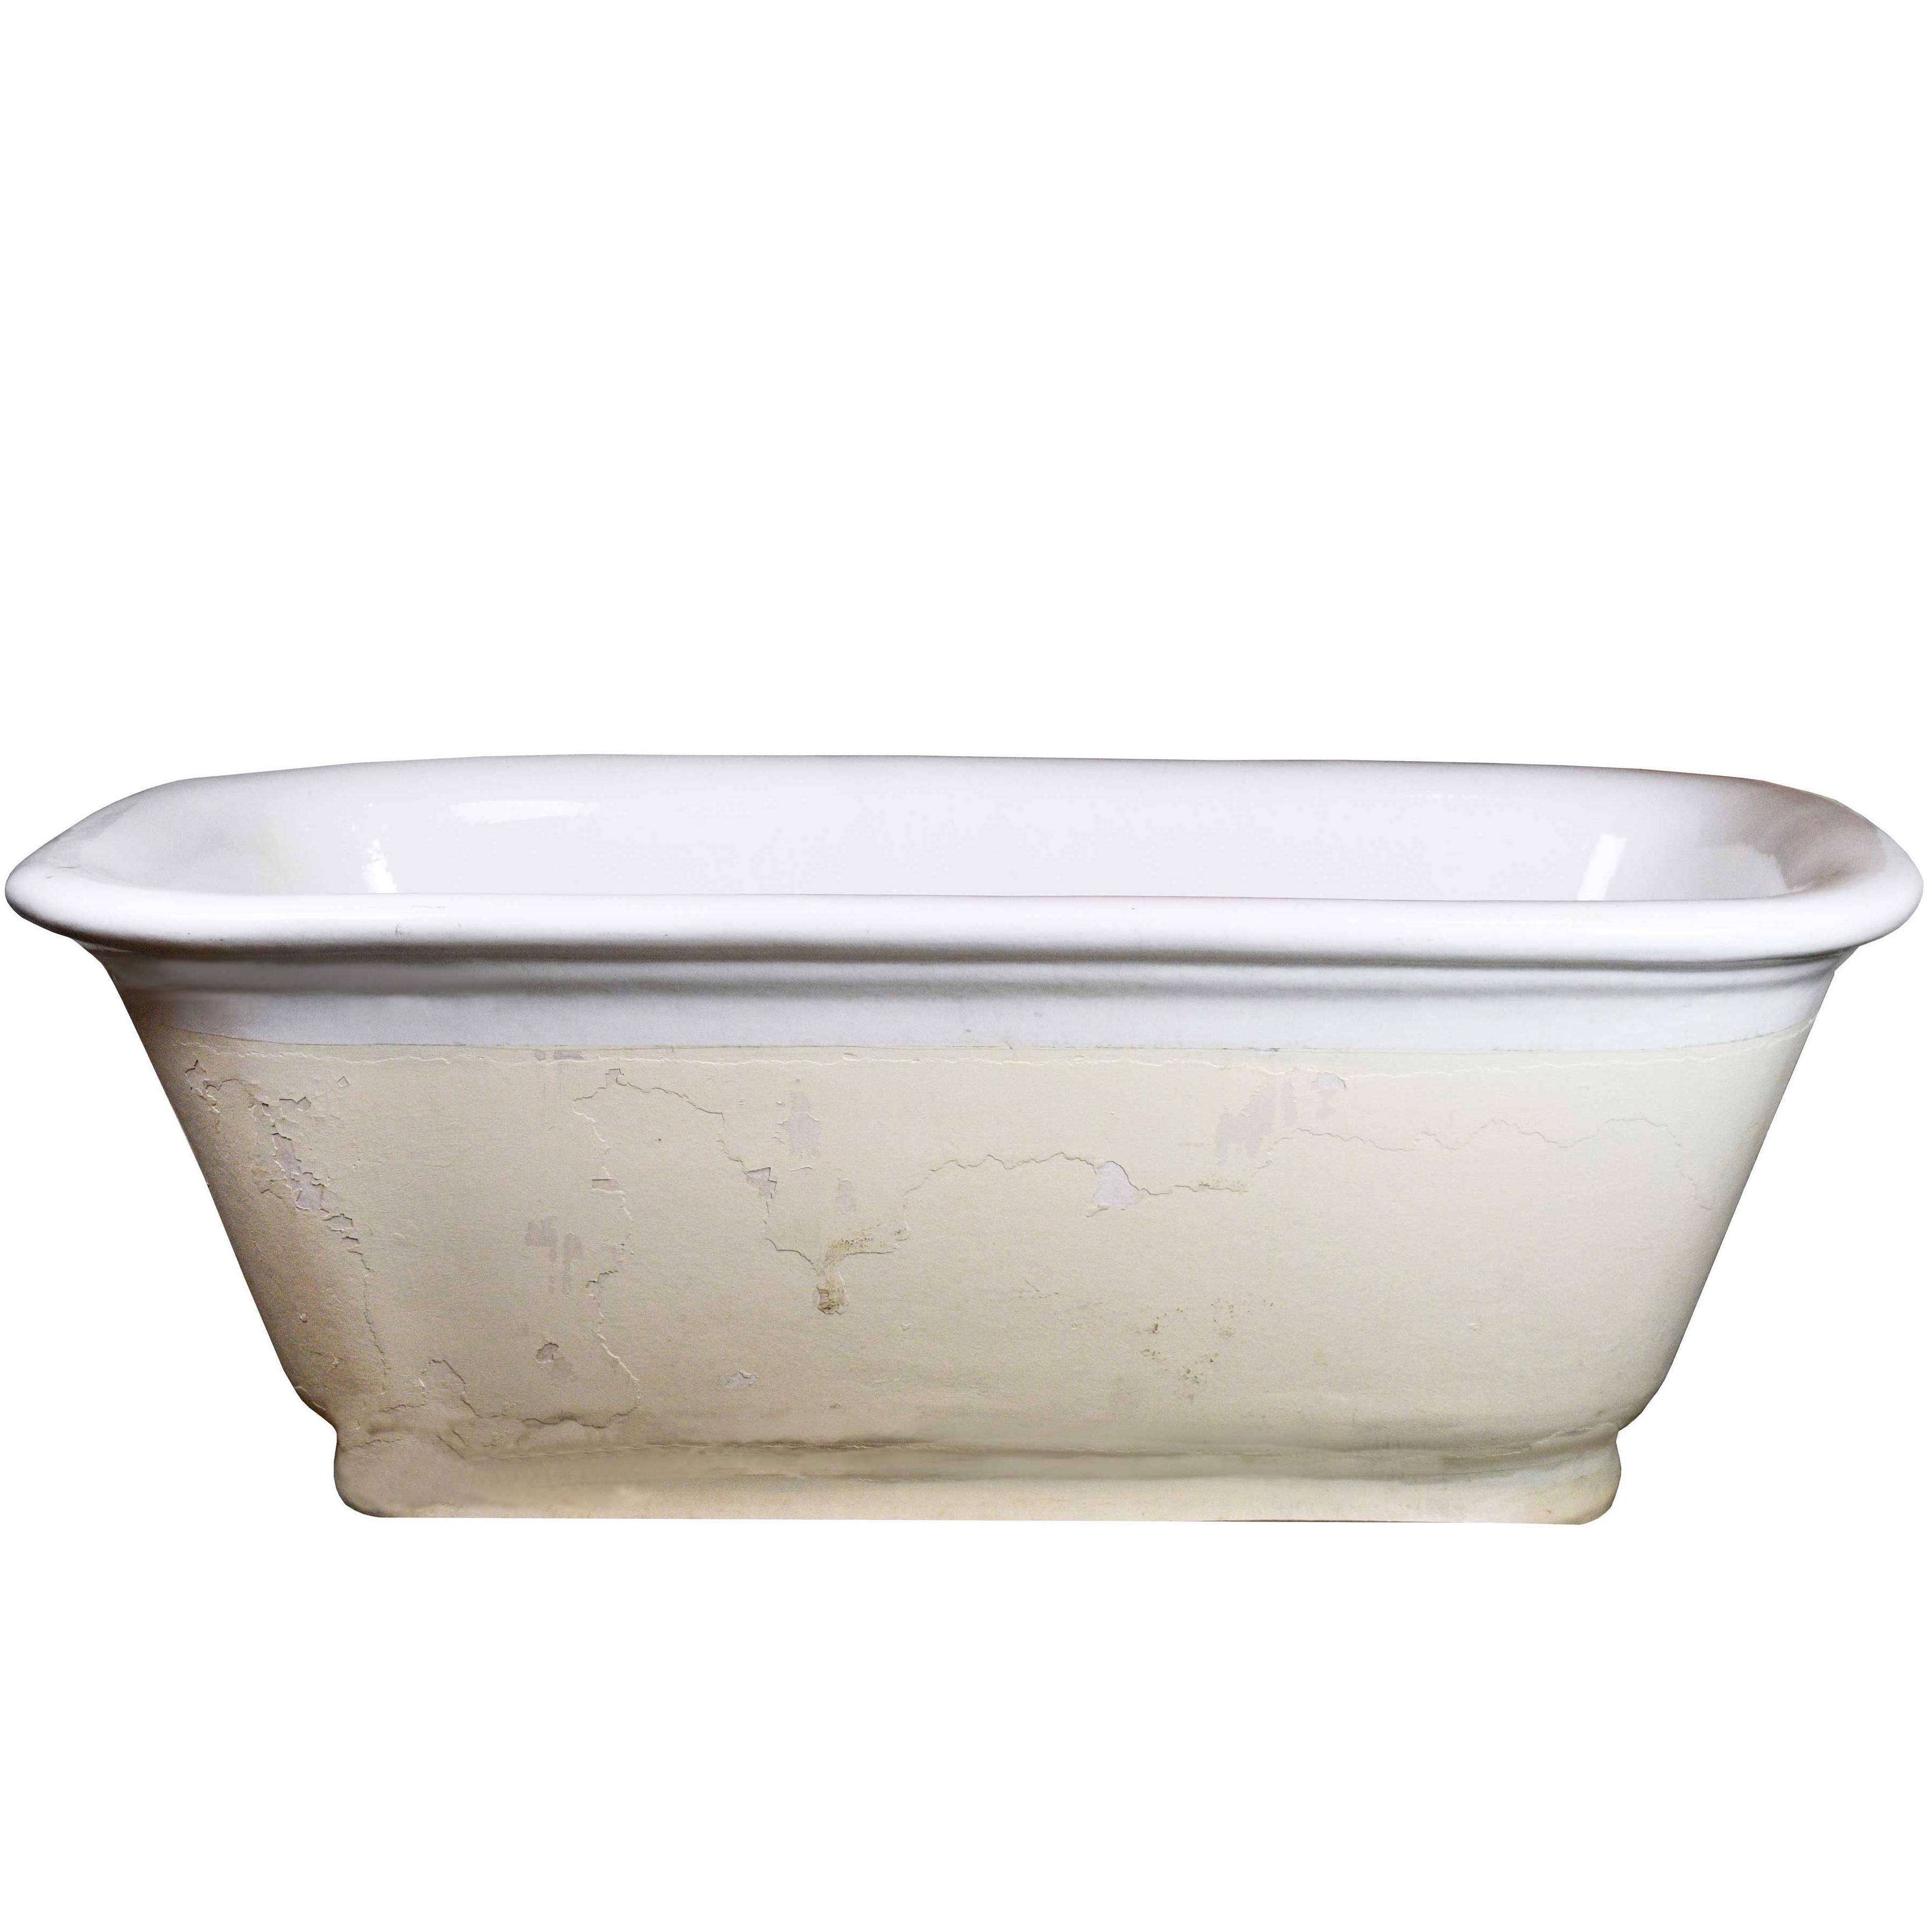 Porcelain Center Drain Tub For Sale at 1stdibs